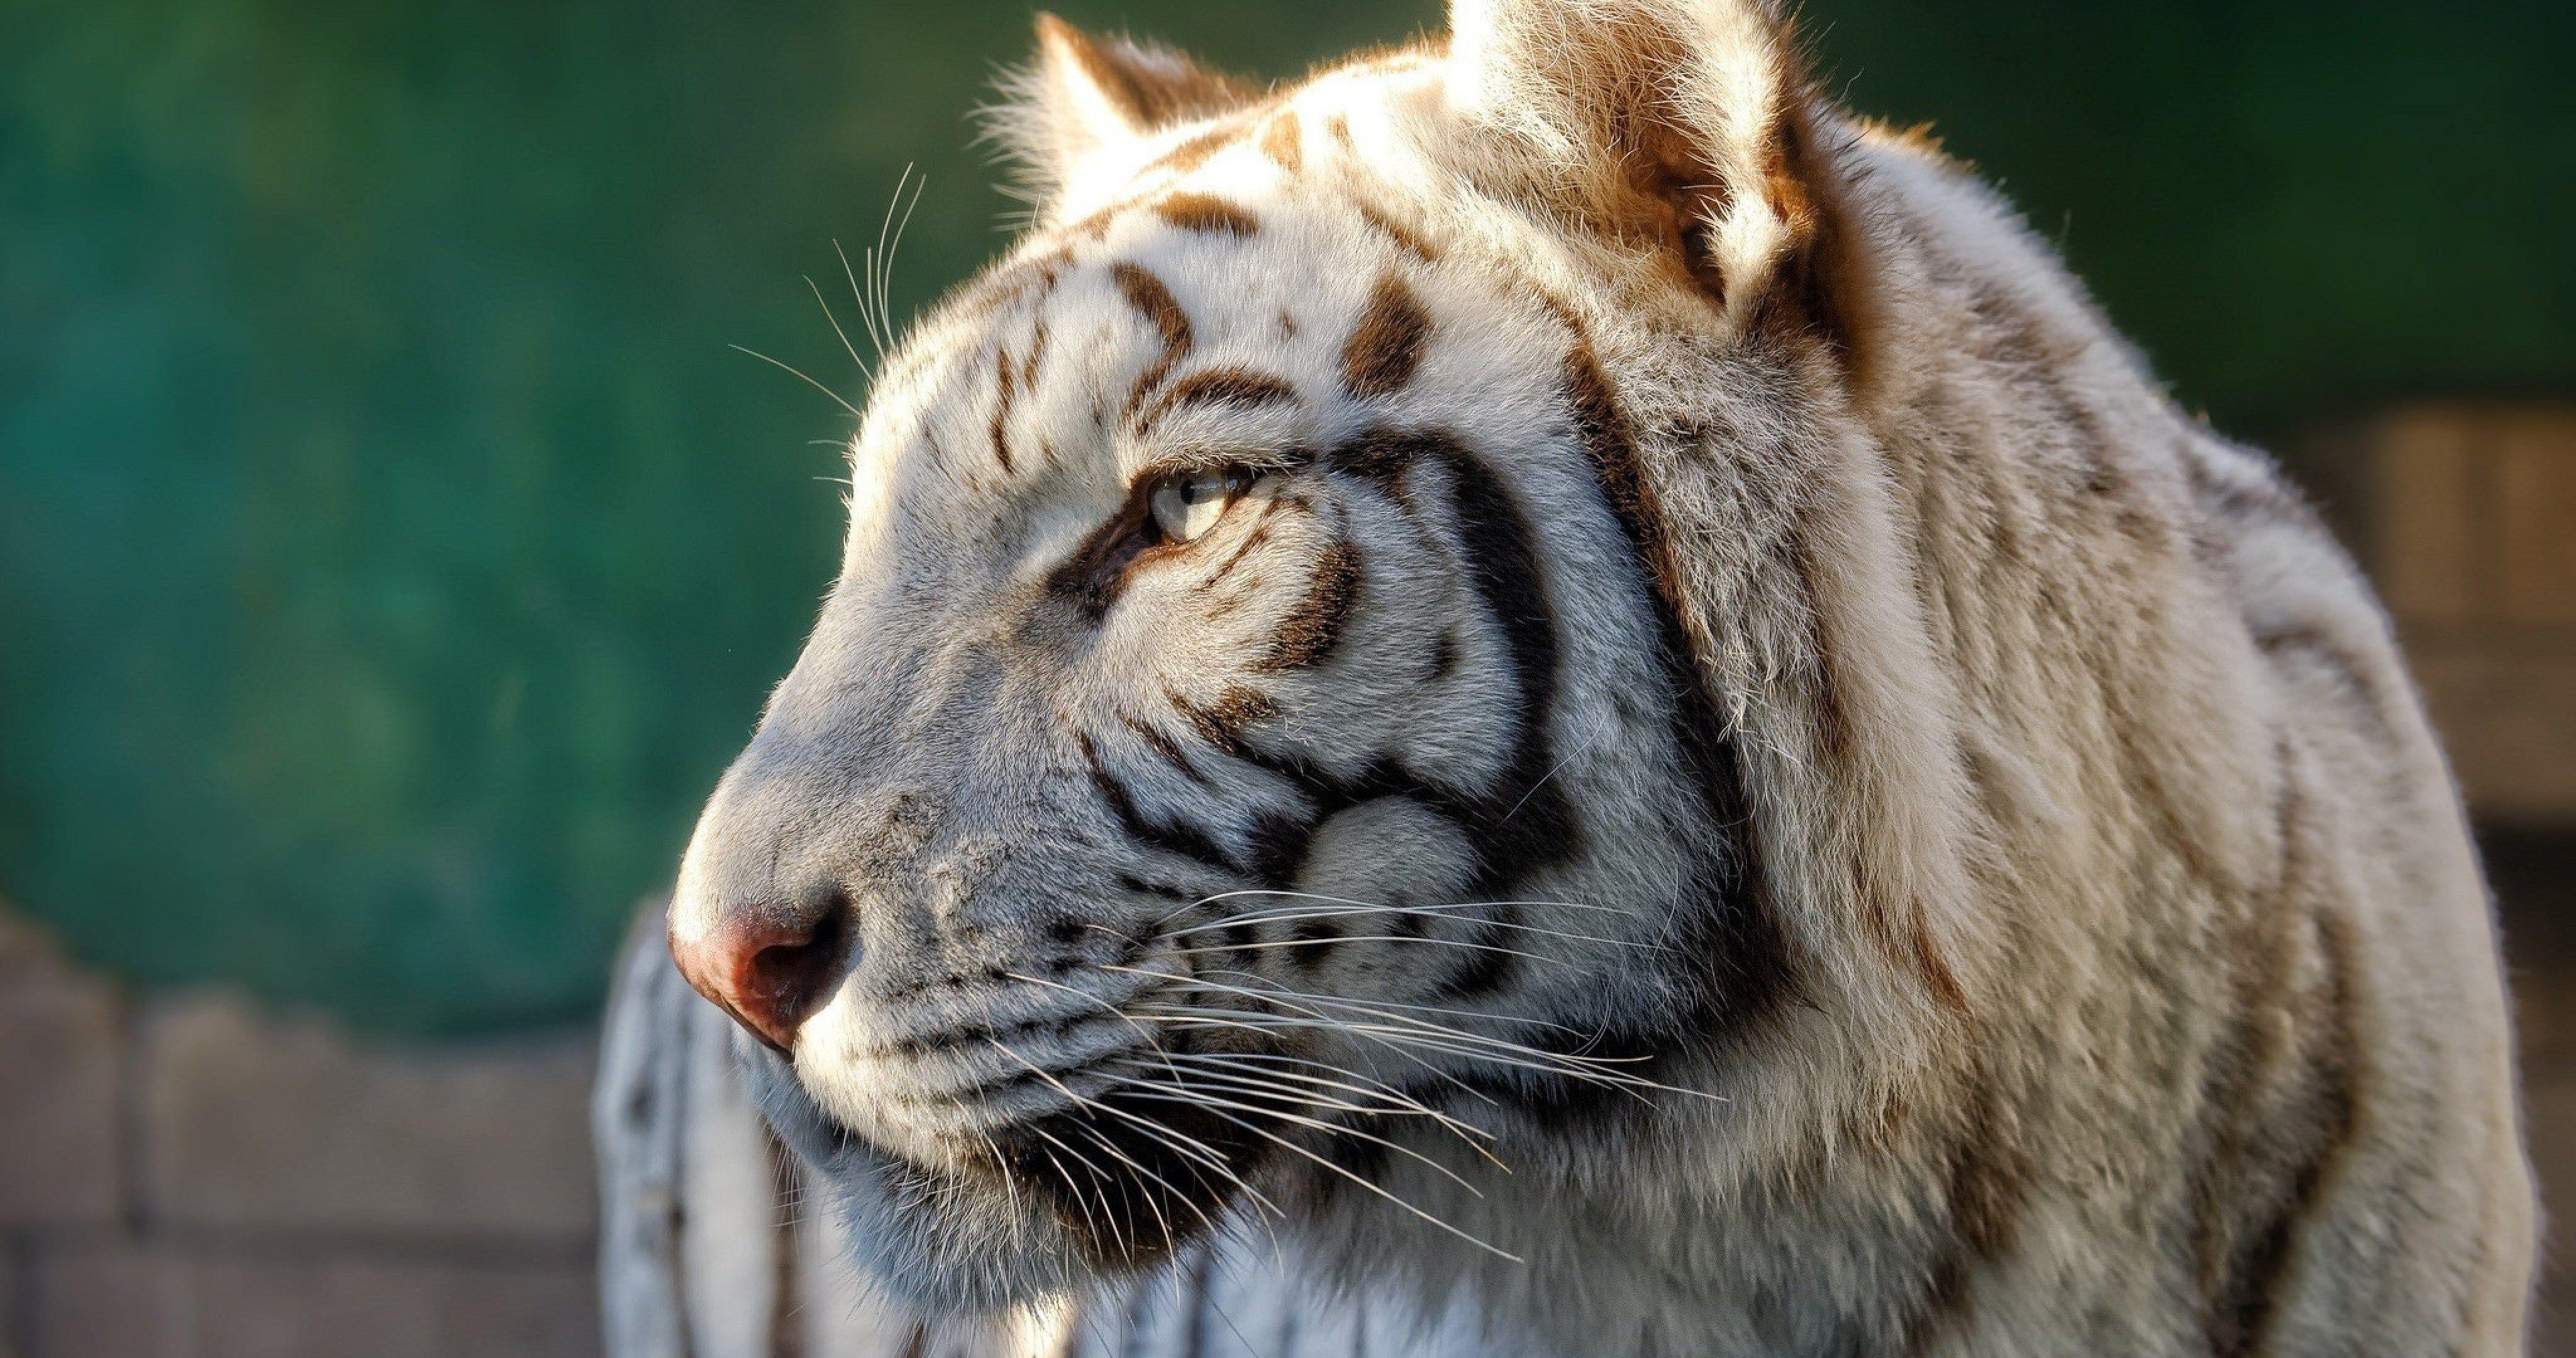 Profile White Tiger 4k Ultra Hd Wallpaper Tiger Profile Tiger Hd Wallpaper